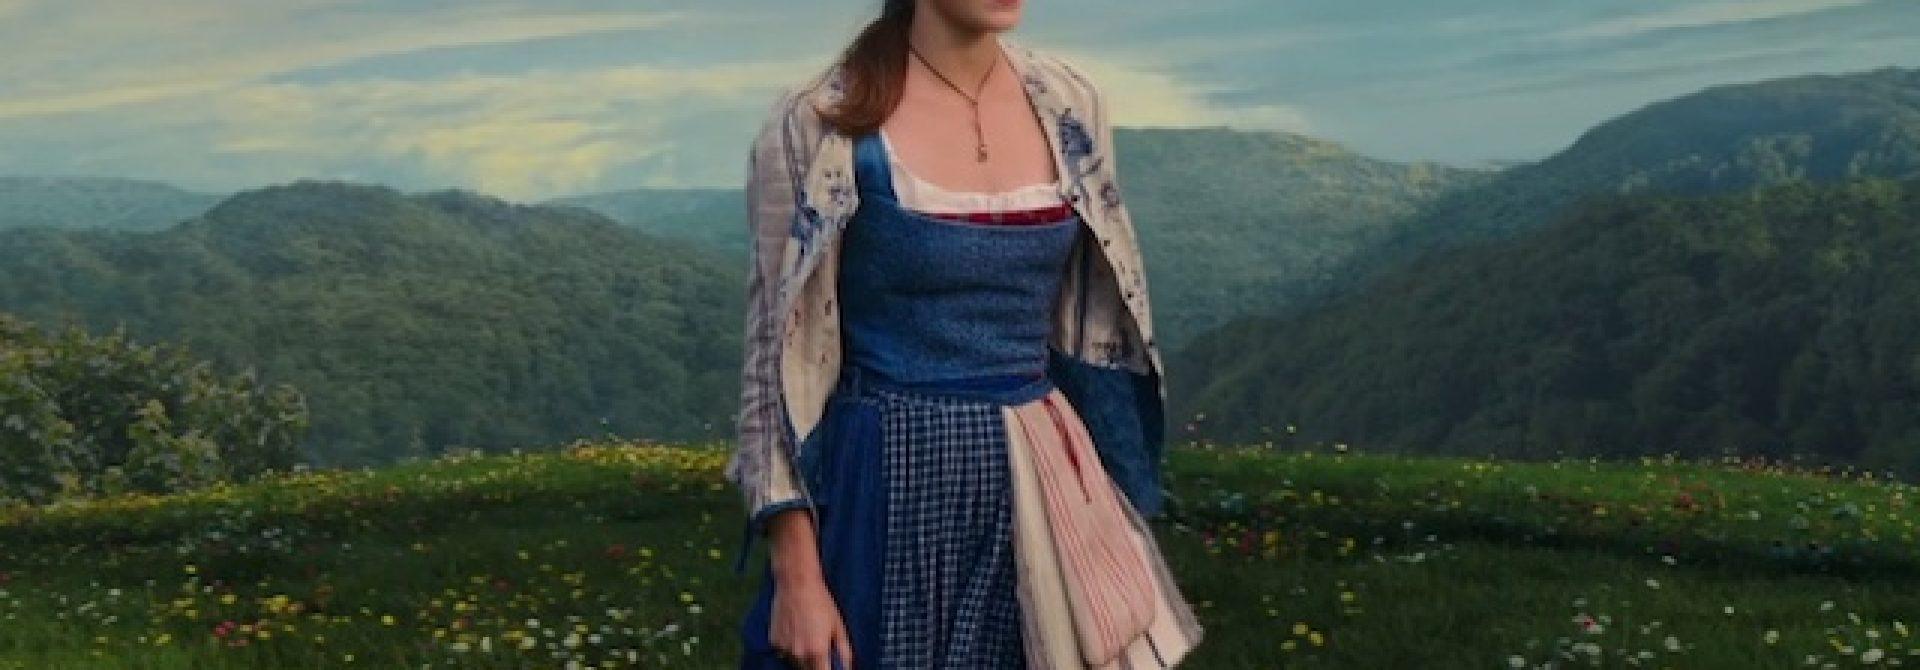 Beauty and the Beast: Emma Watson Sings as Belle